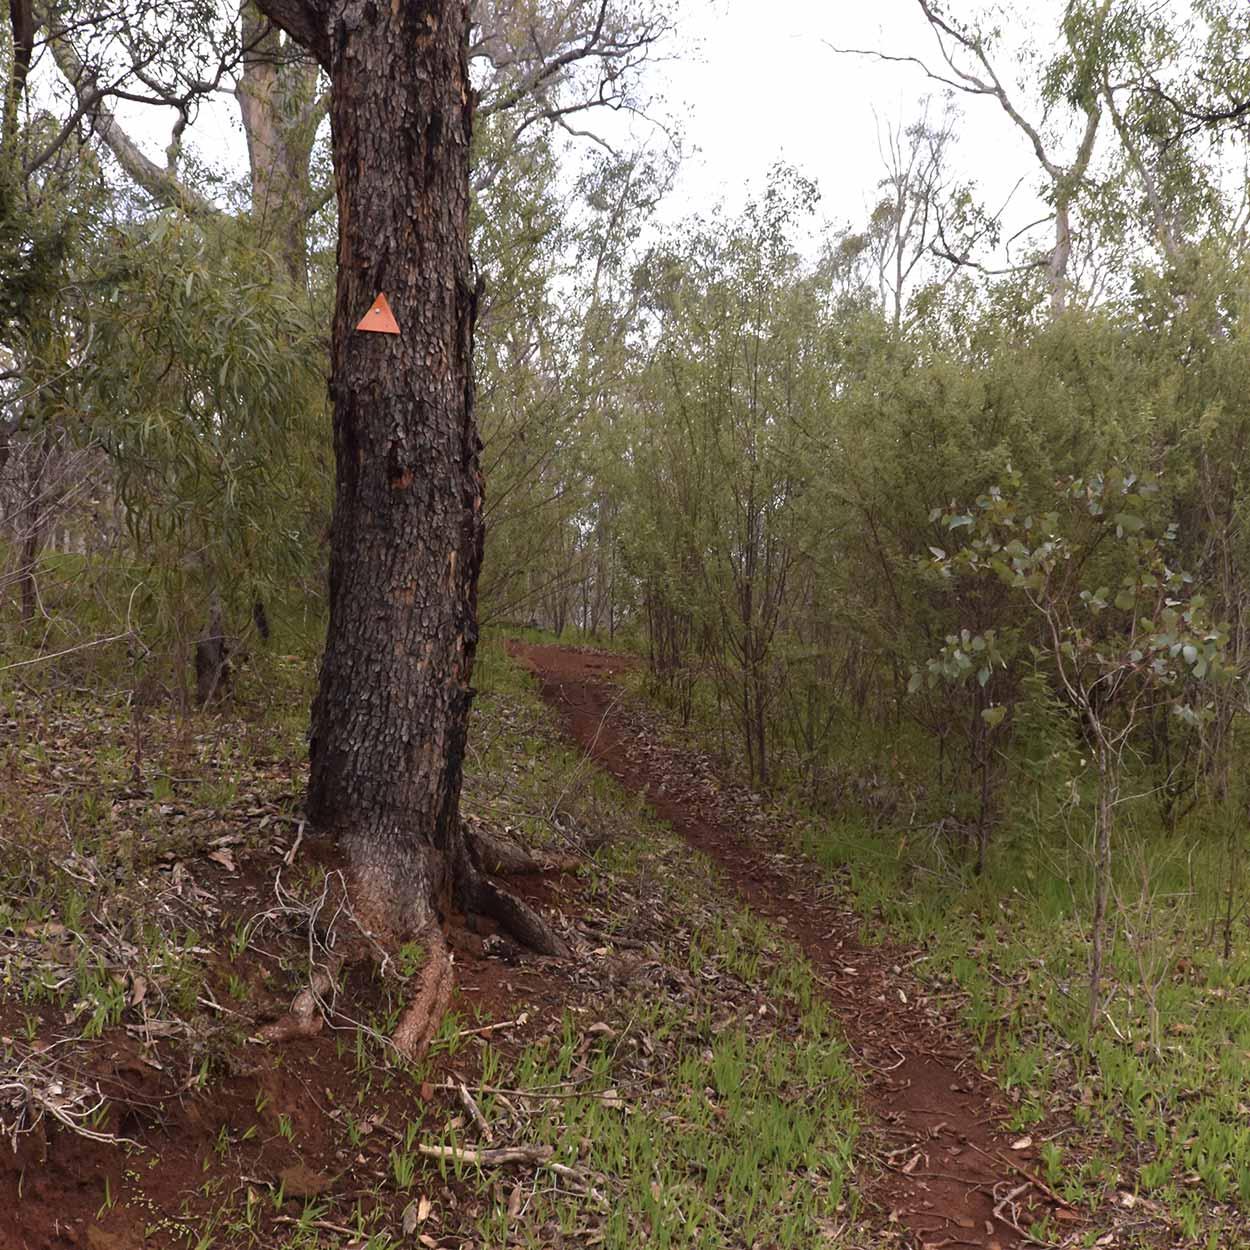 Echindna Trail, Wungong Regional Park, Perth, Western Australia